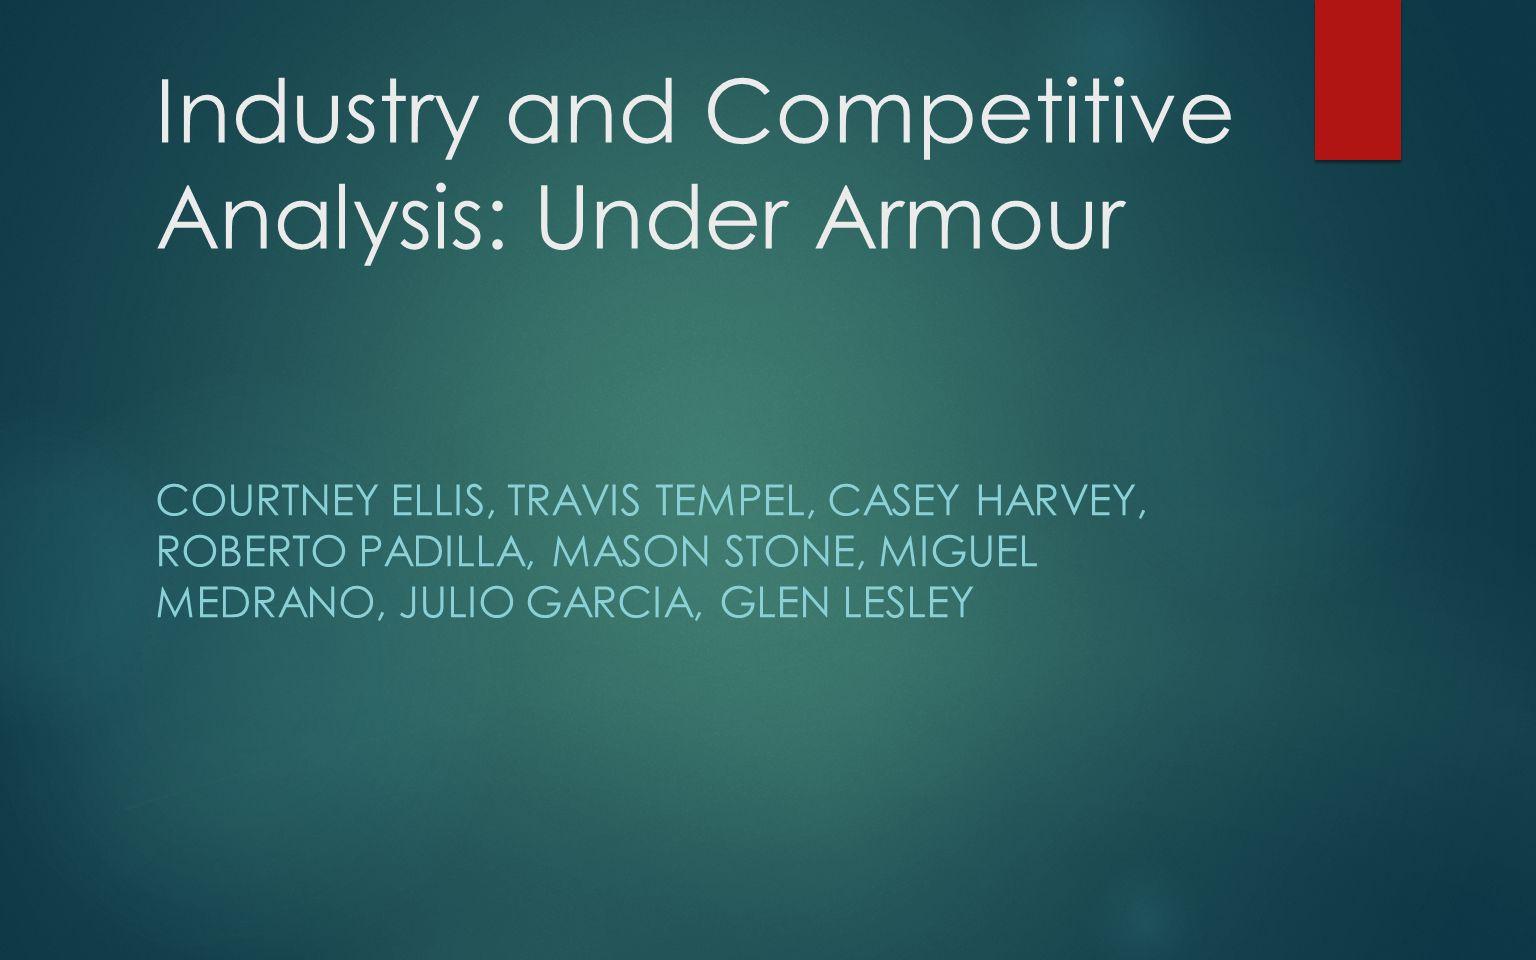 Industry and Competitive Analysis: Under Armour COURTNEY ELLIS, TRAVIS TEMPEL, CASEY HARVEY, ROBERTO PADILLA, MASON STONE, MIGUEL MEDRANO, JULIO GARCI